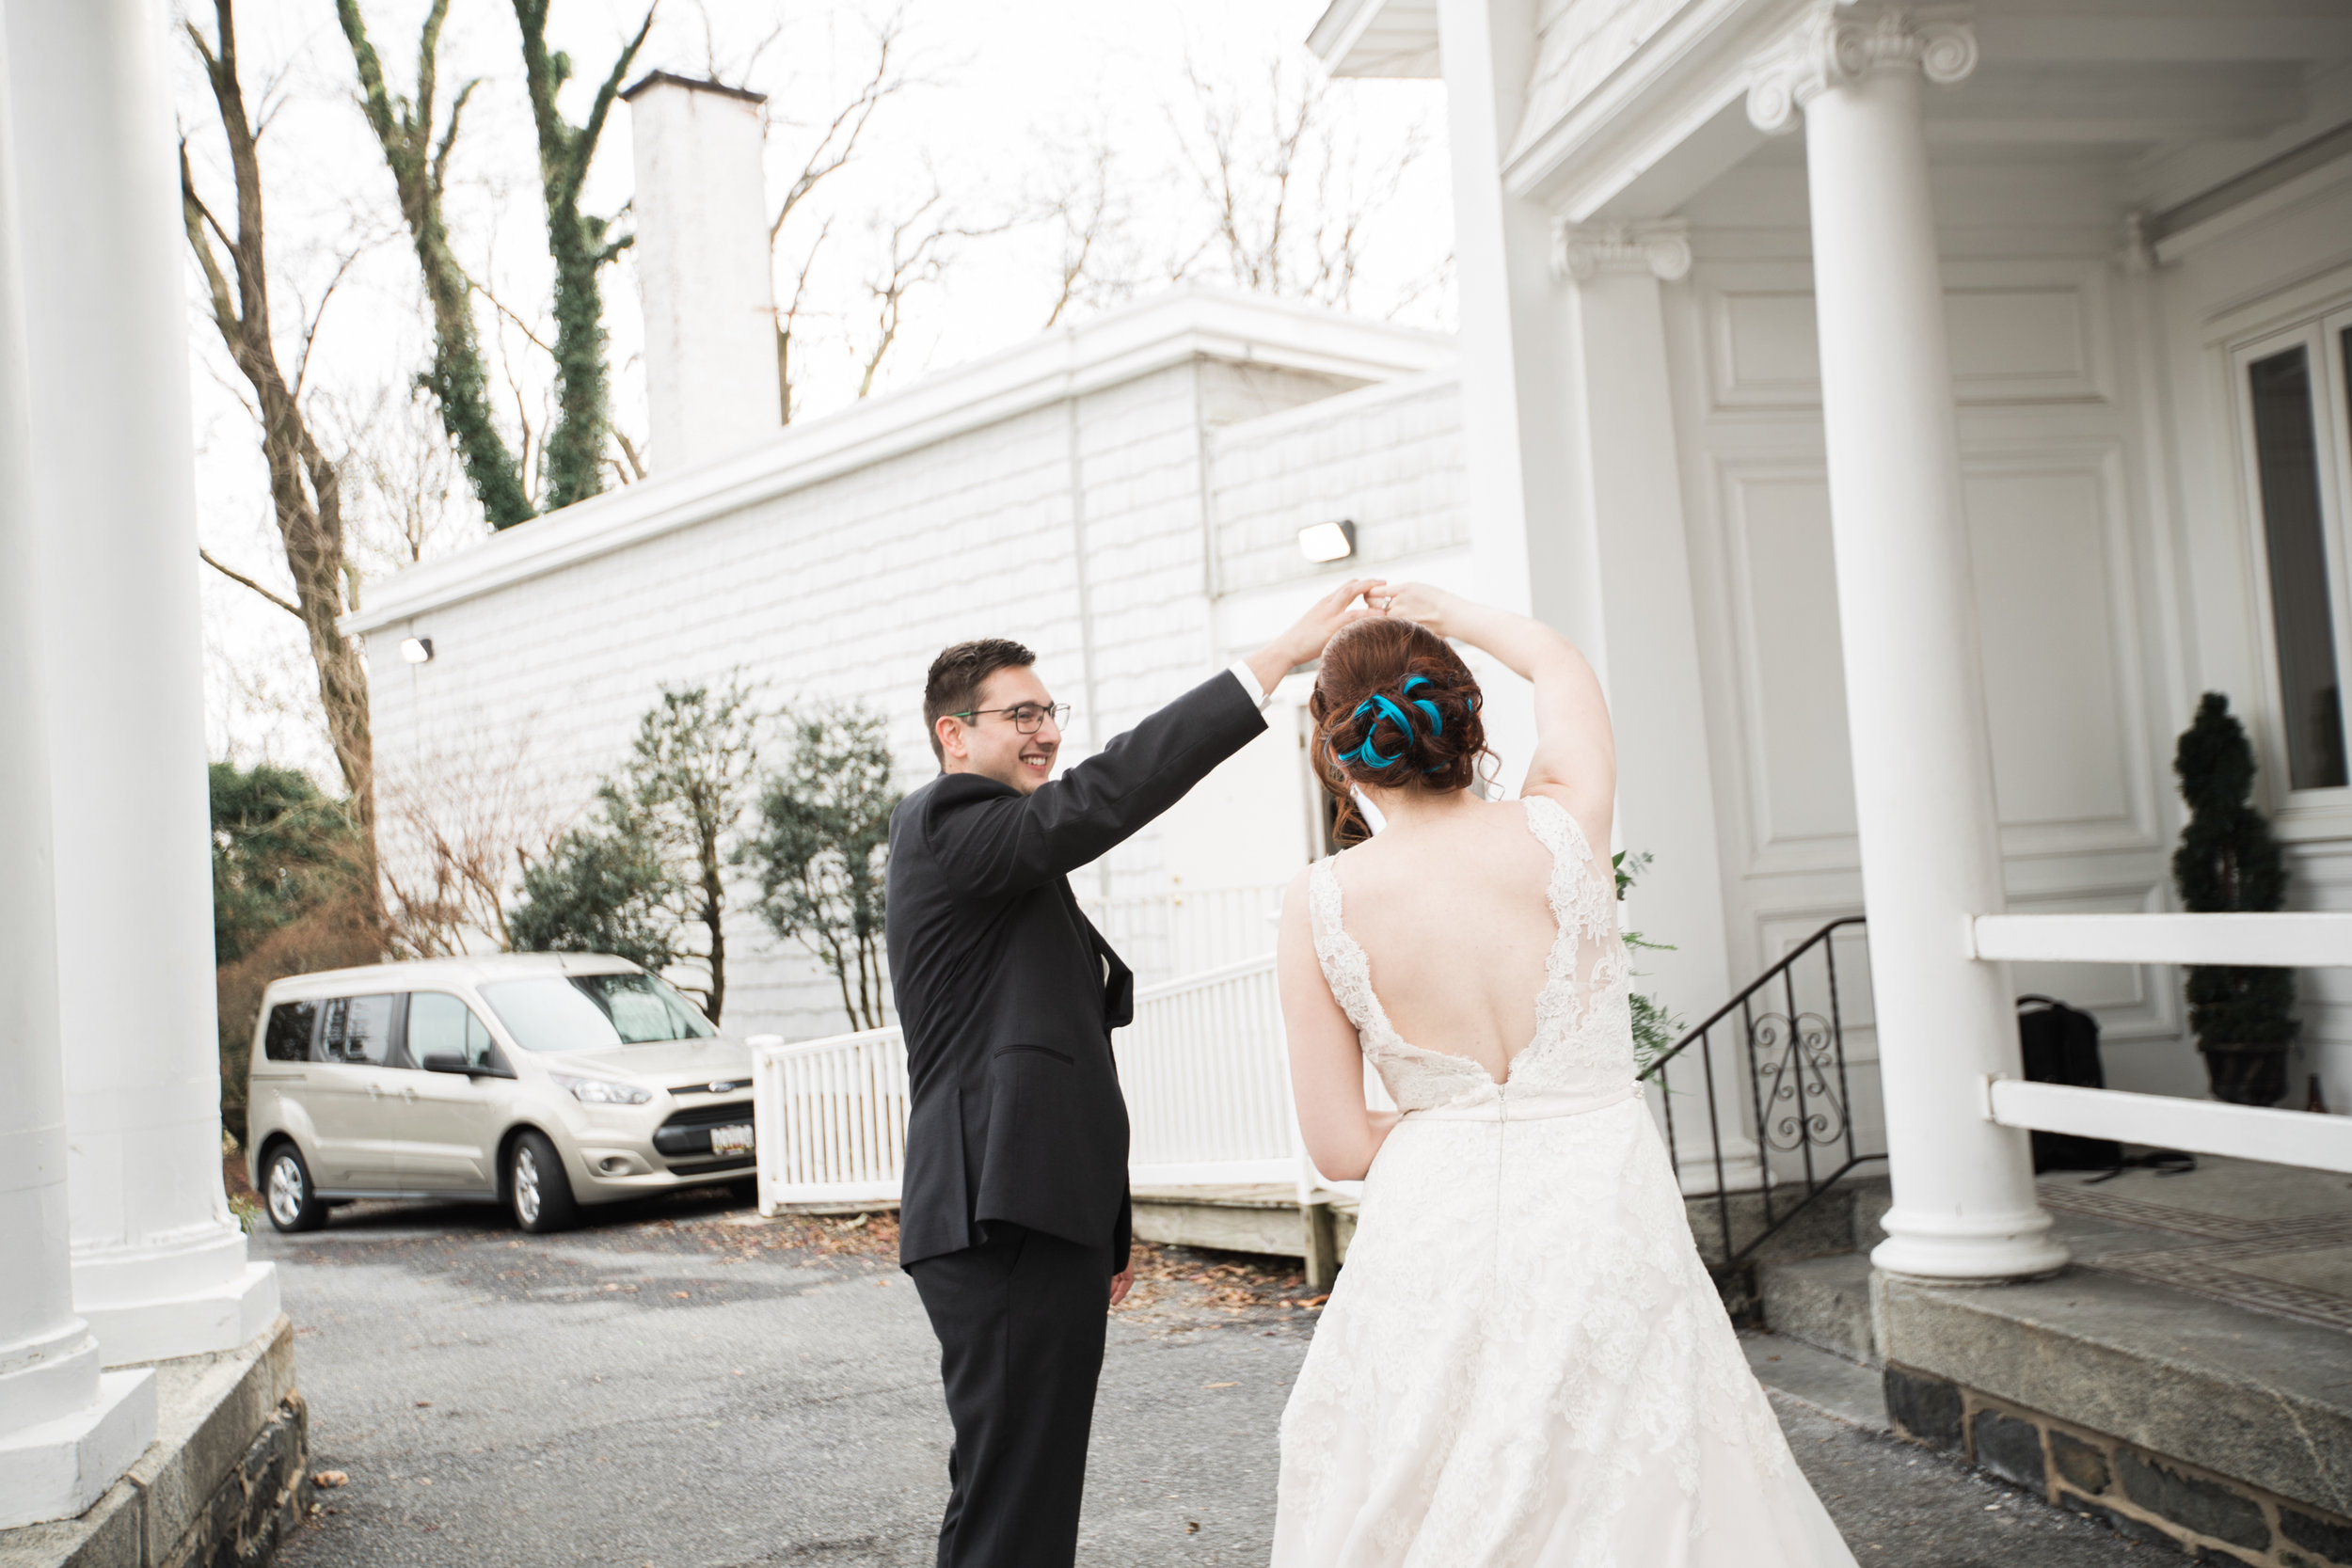 Harry Potter Wedding at Overhills Mansion Catonville Maryland Wedding Photographers Megapixels Media (36 of 134).jpg